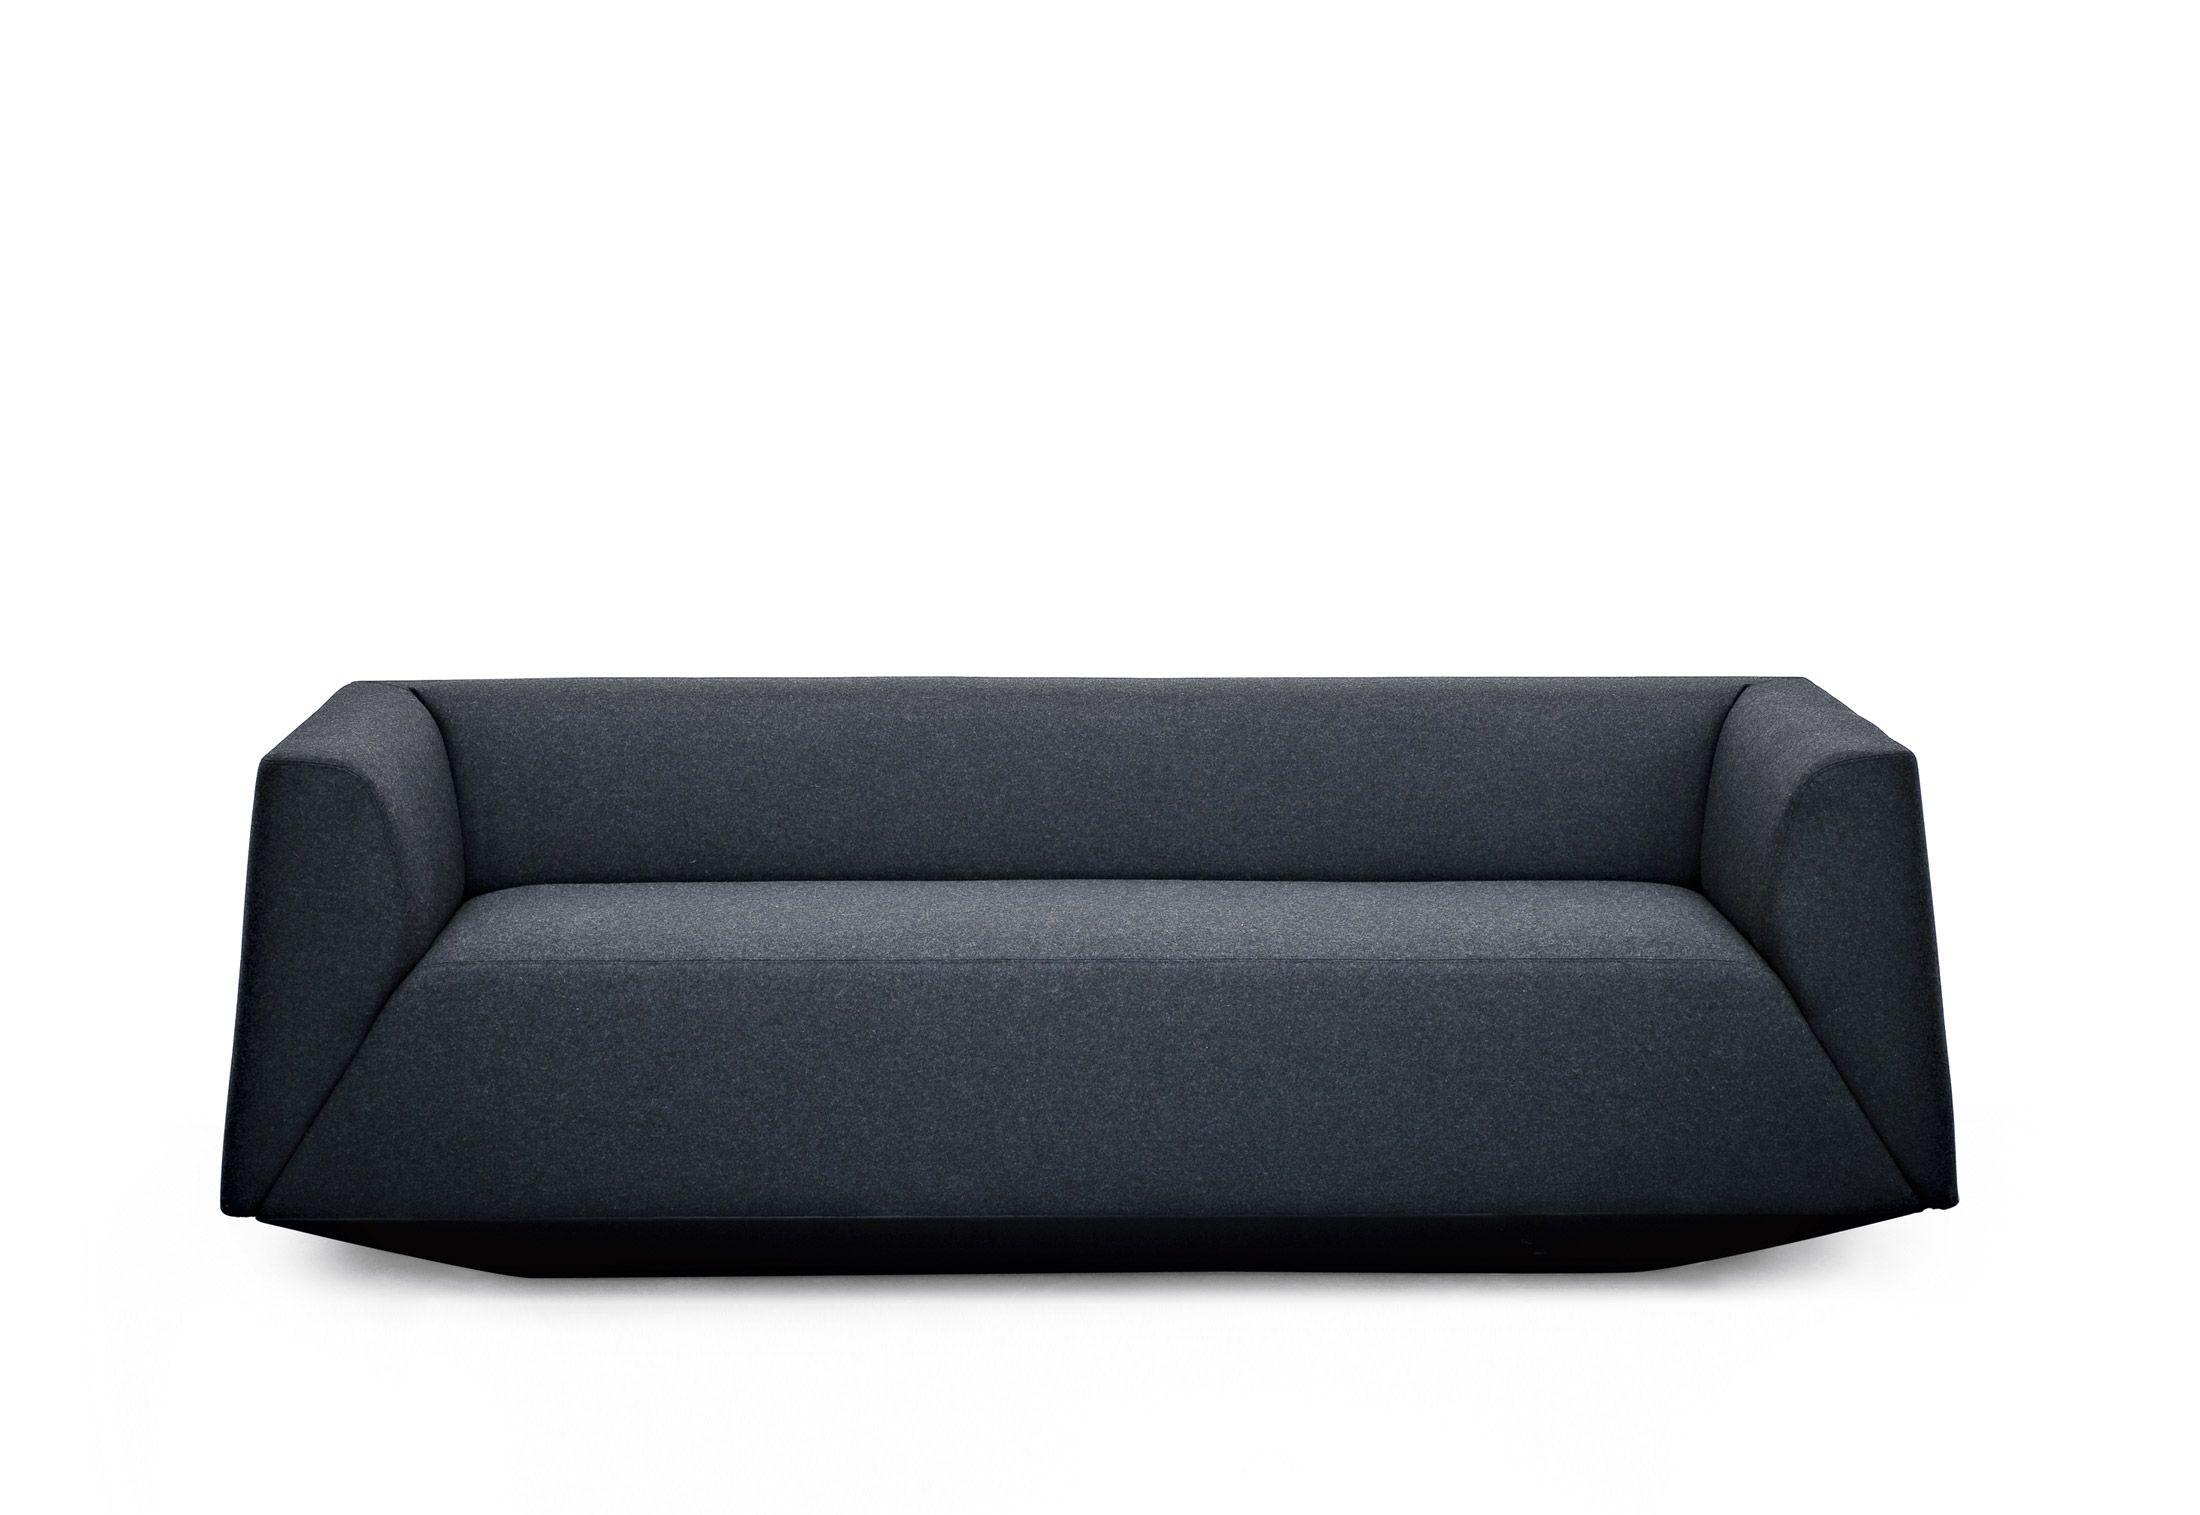 Divani Casa Begonia Modern Taupe Italian Leather Reclining Sofa